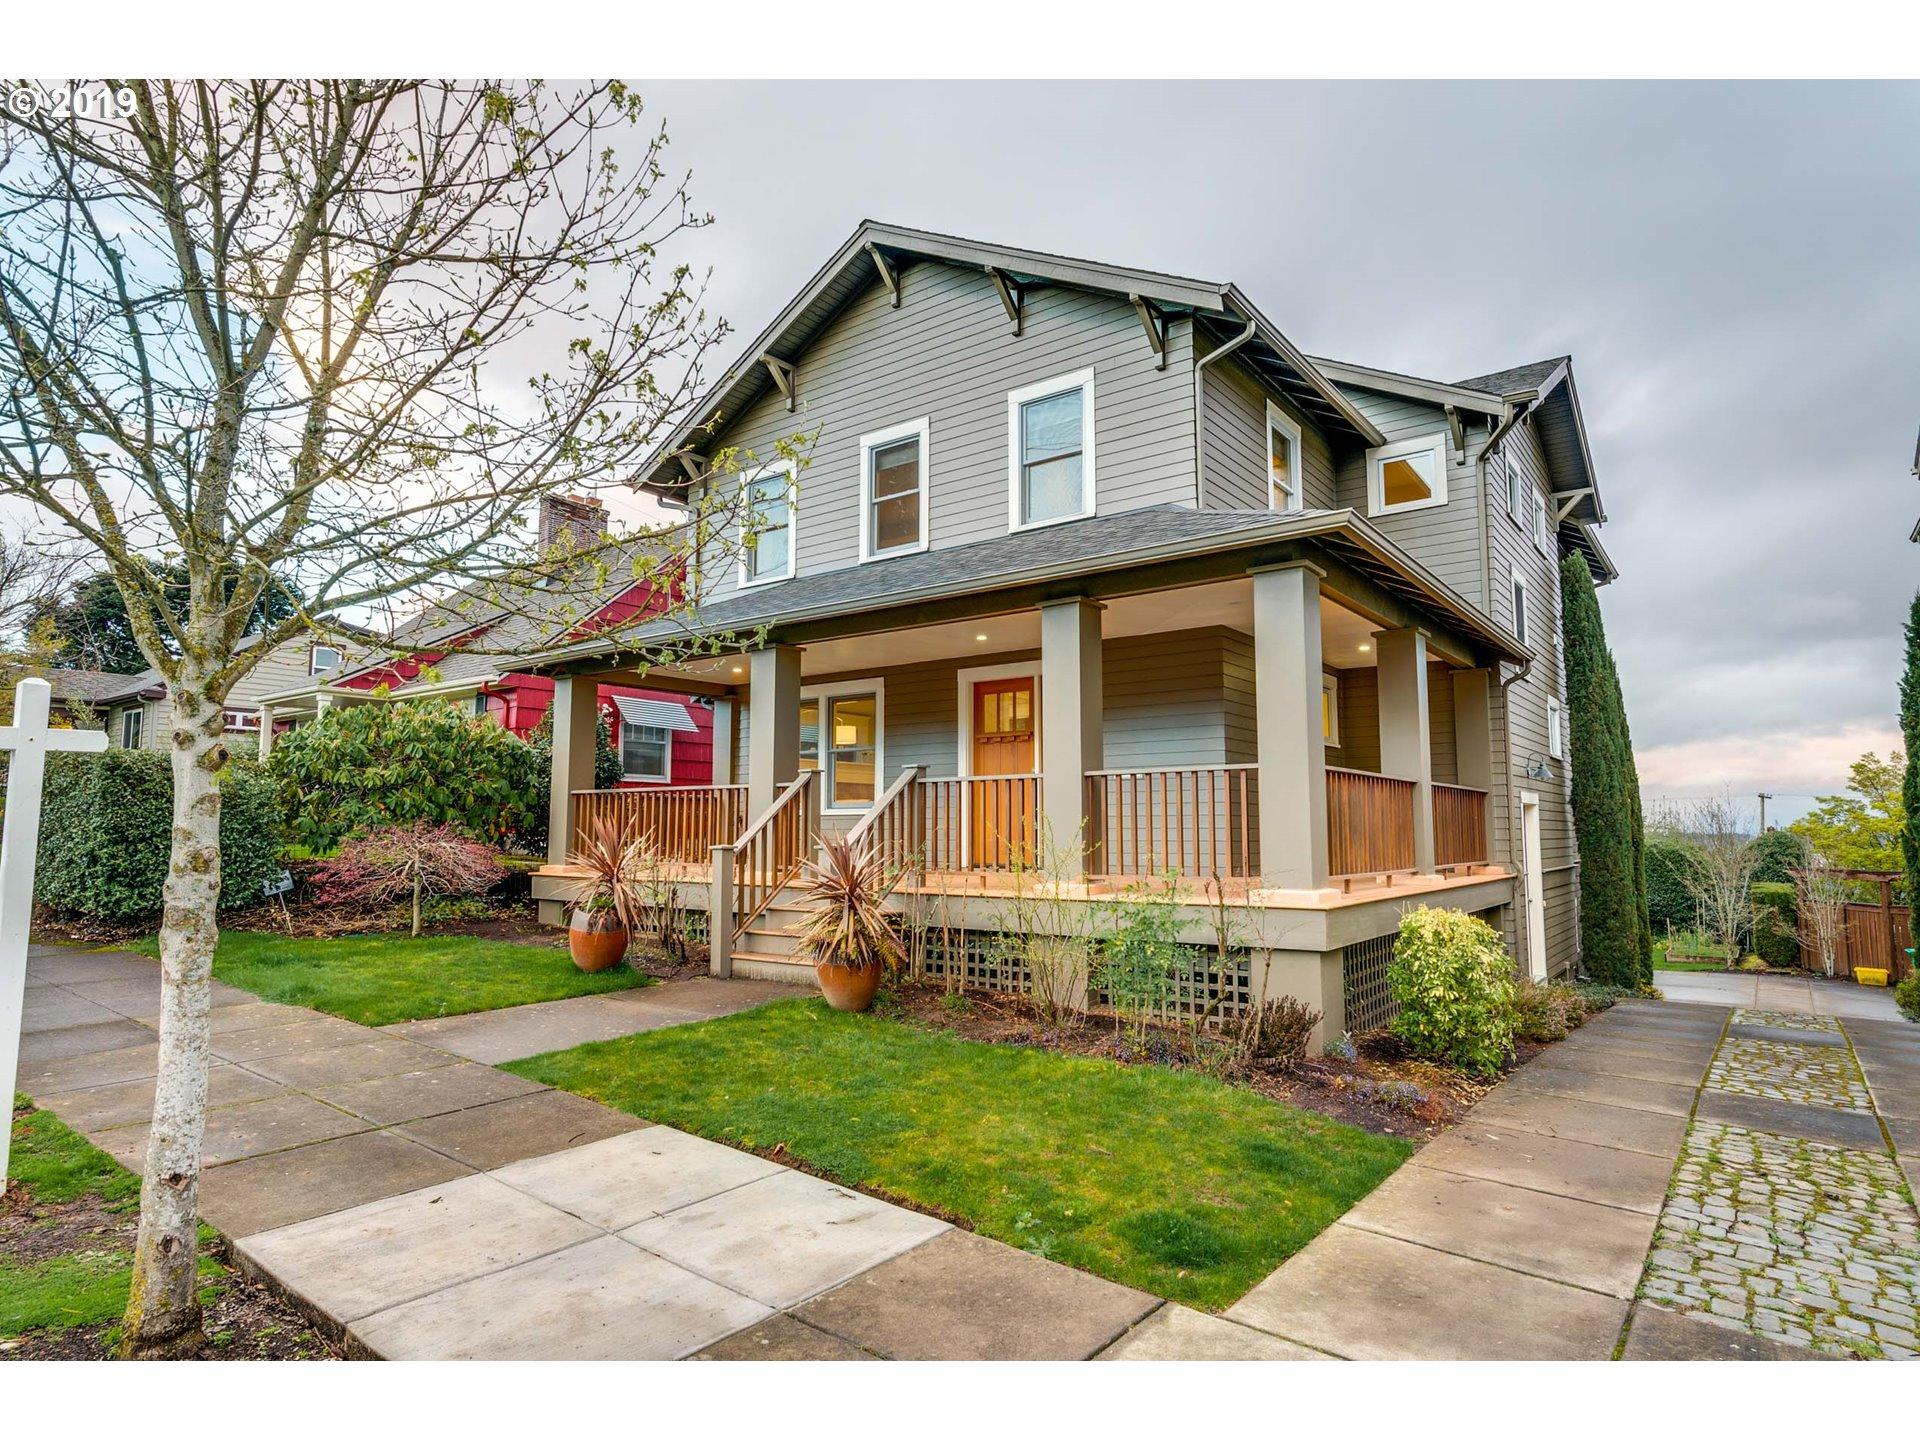 522 SE 70TH AVE, Portland OR 97215